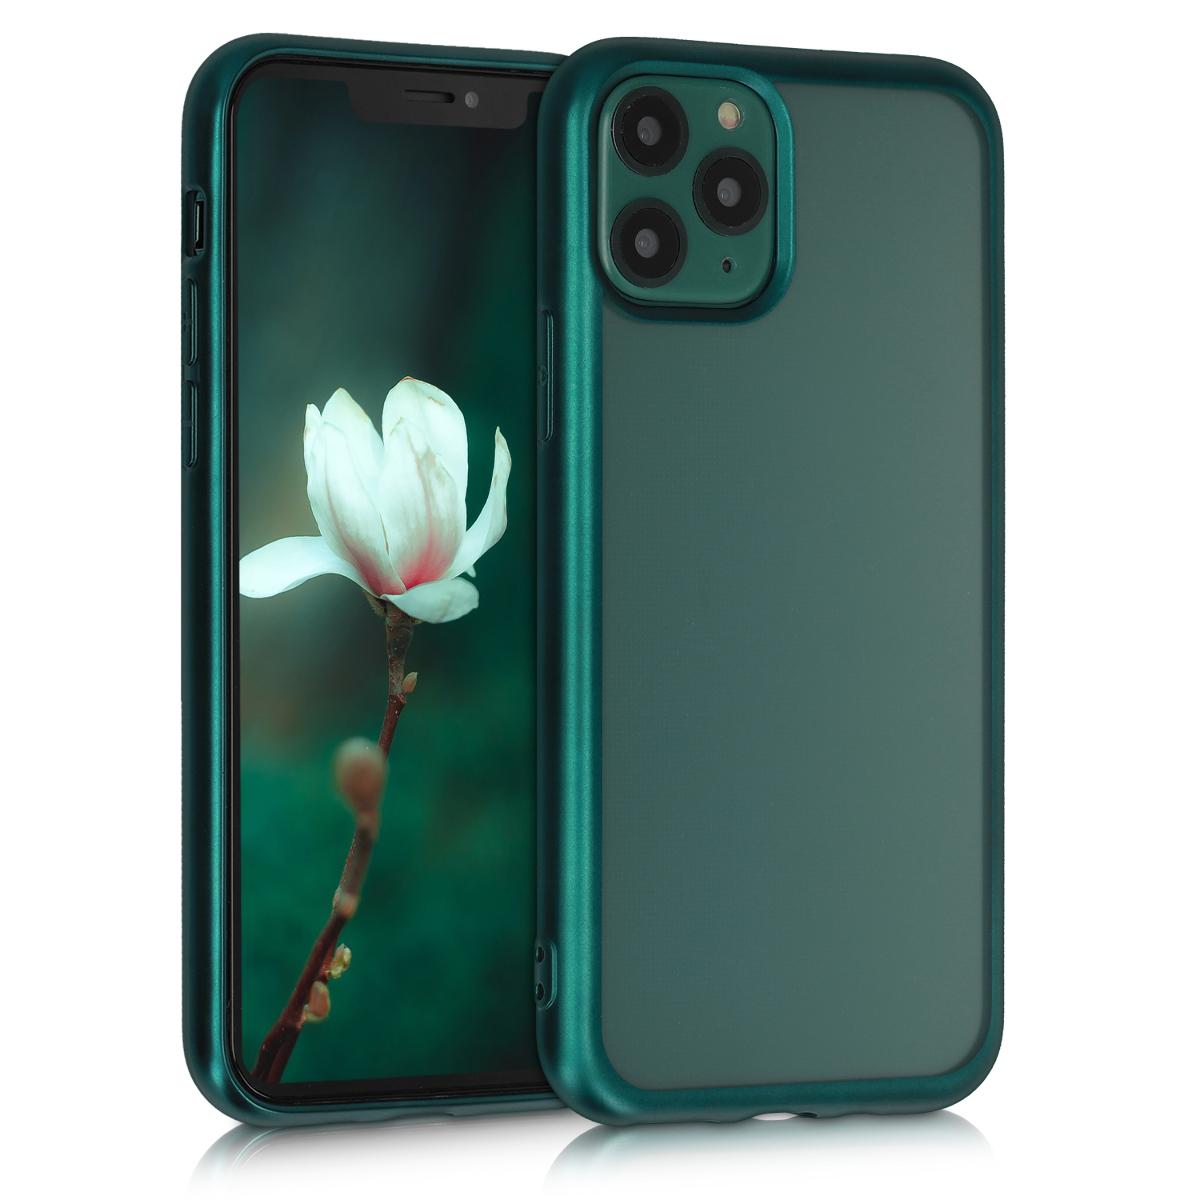 Kvalitní silikonové TPU pouzdro pro Apple iPhone 11 Pro - Dark Green | Matte Transparent